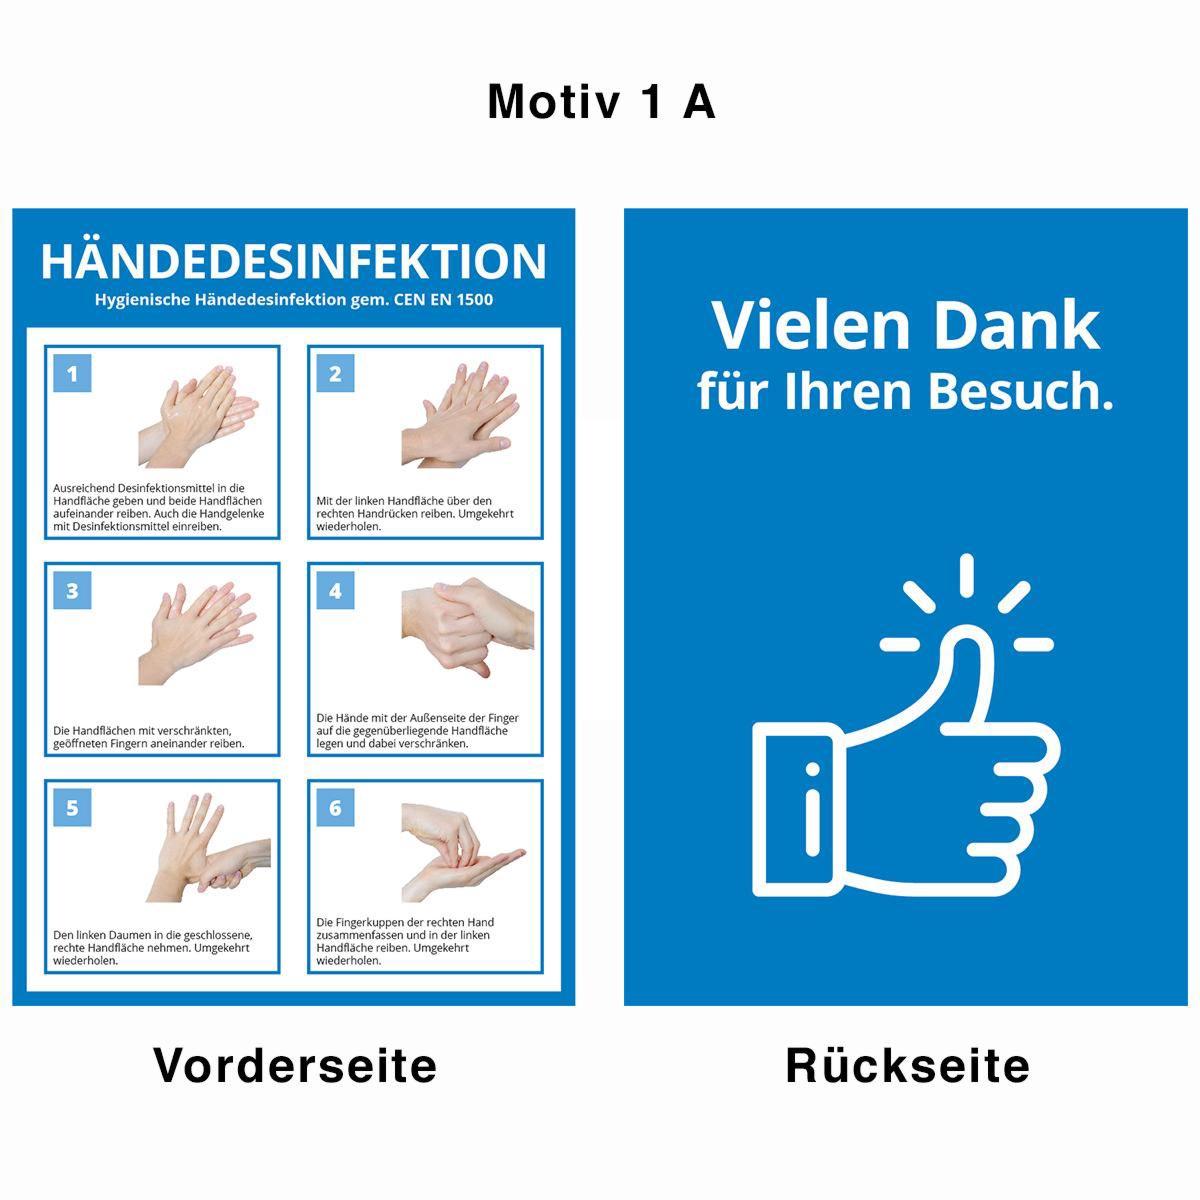 Desinfektionsständer - Motiv 1 A